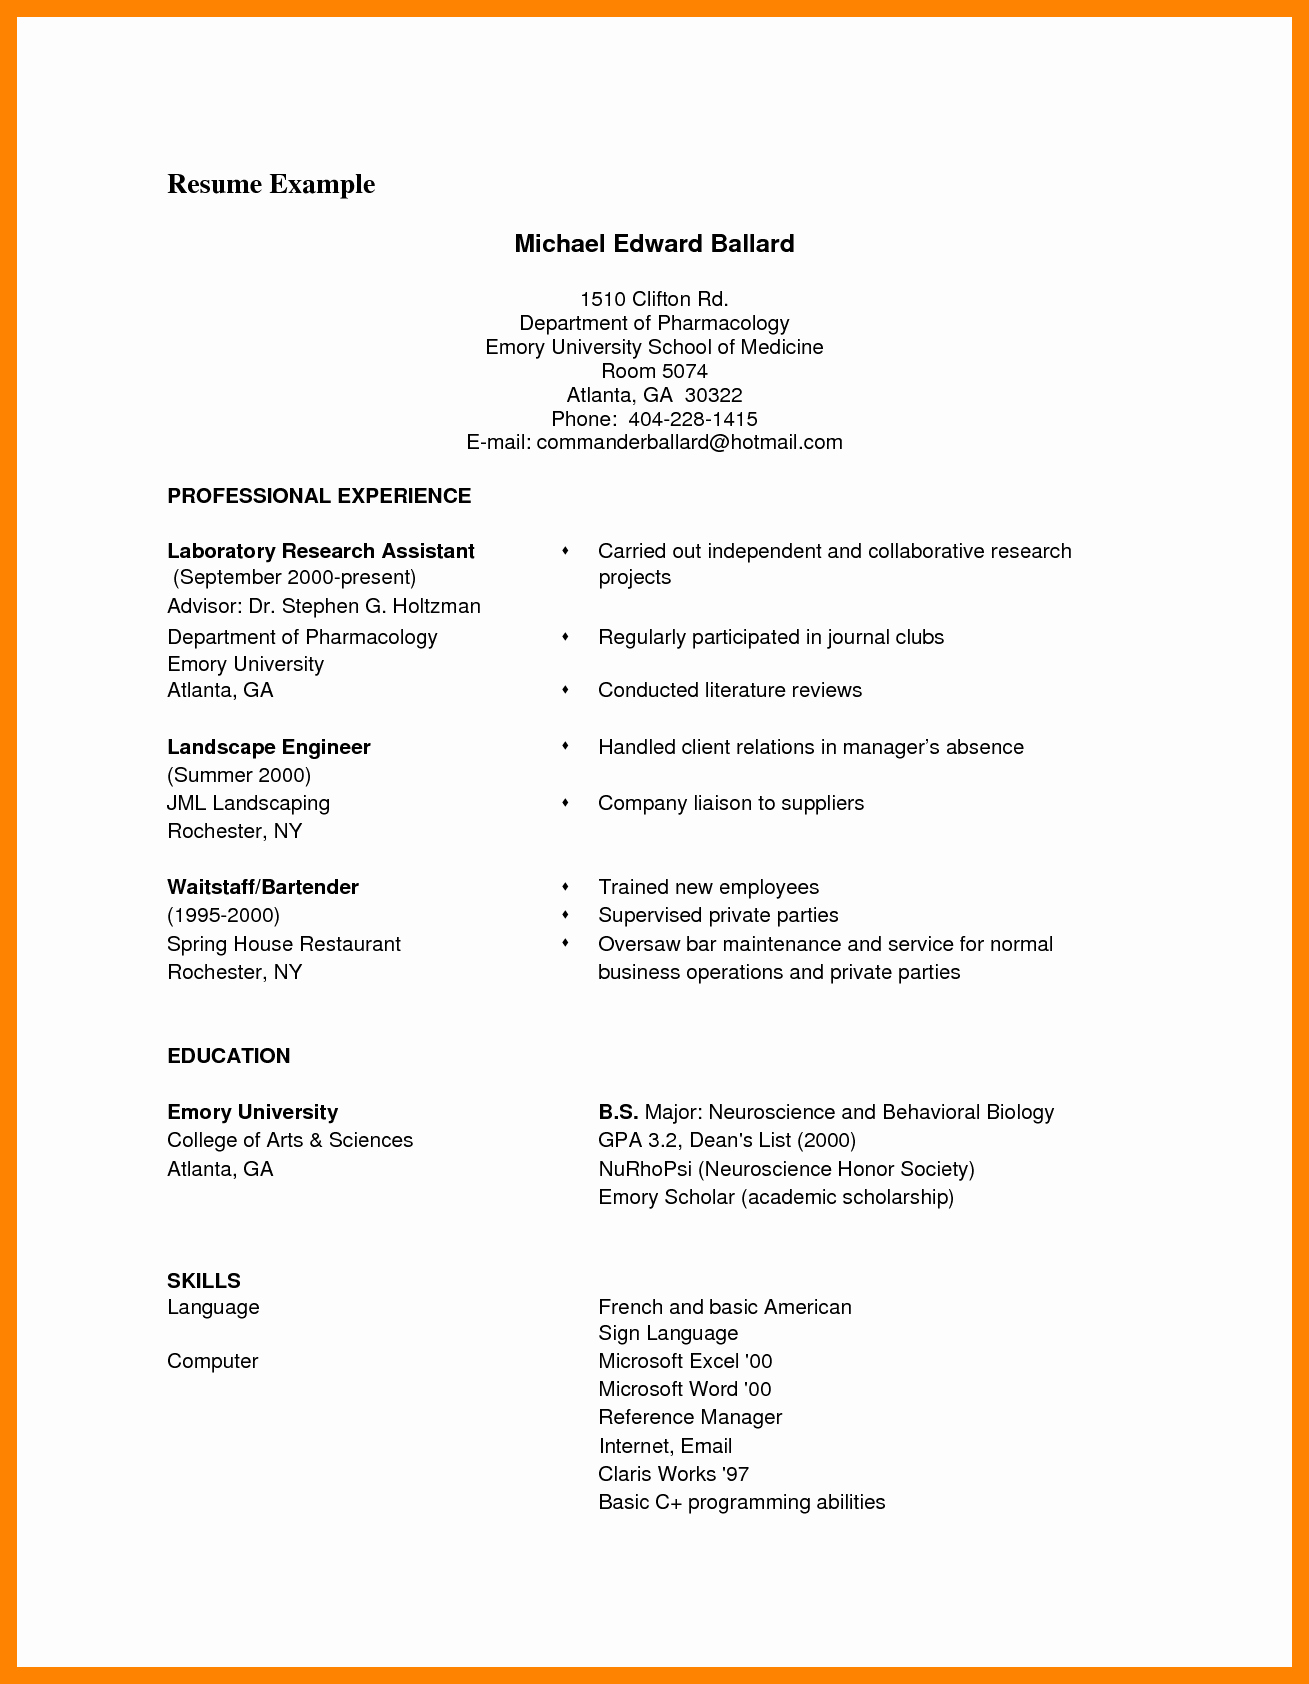 Curriculum Vitae Examples Pdf Fresh 9 Cv format Samples Pdf